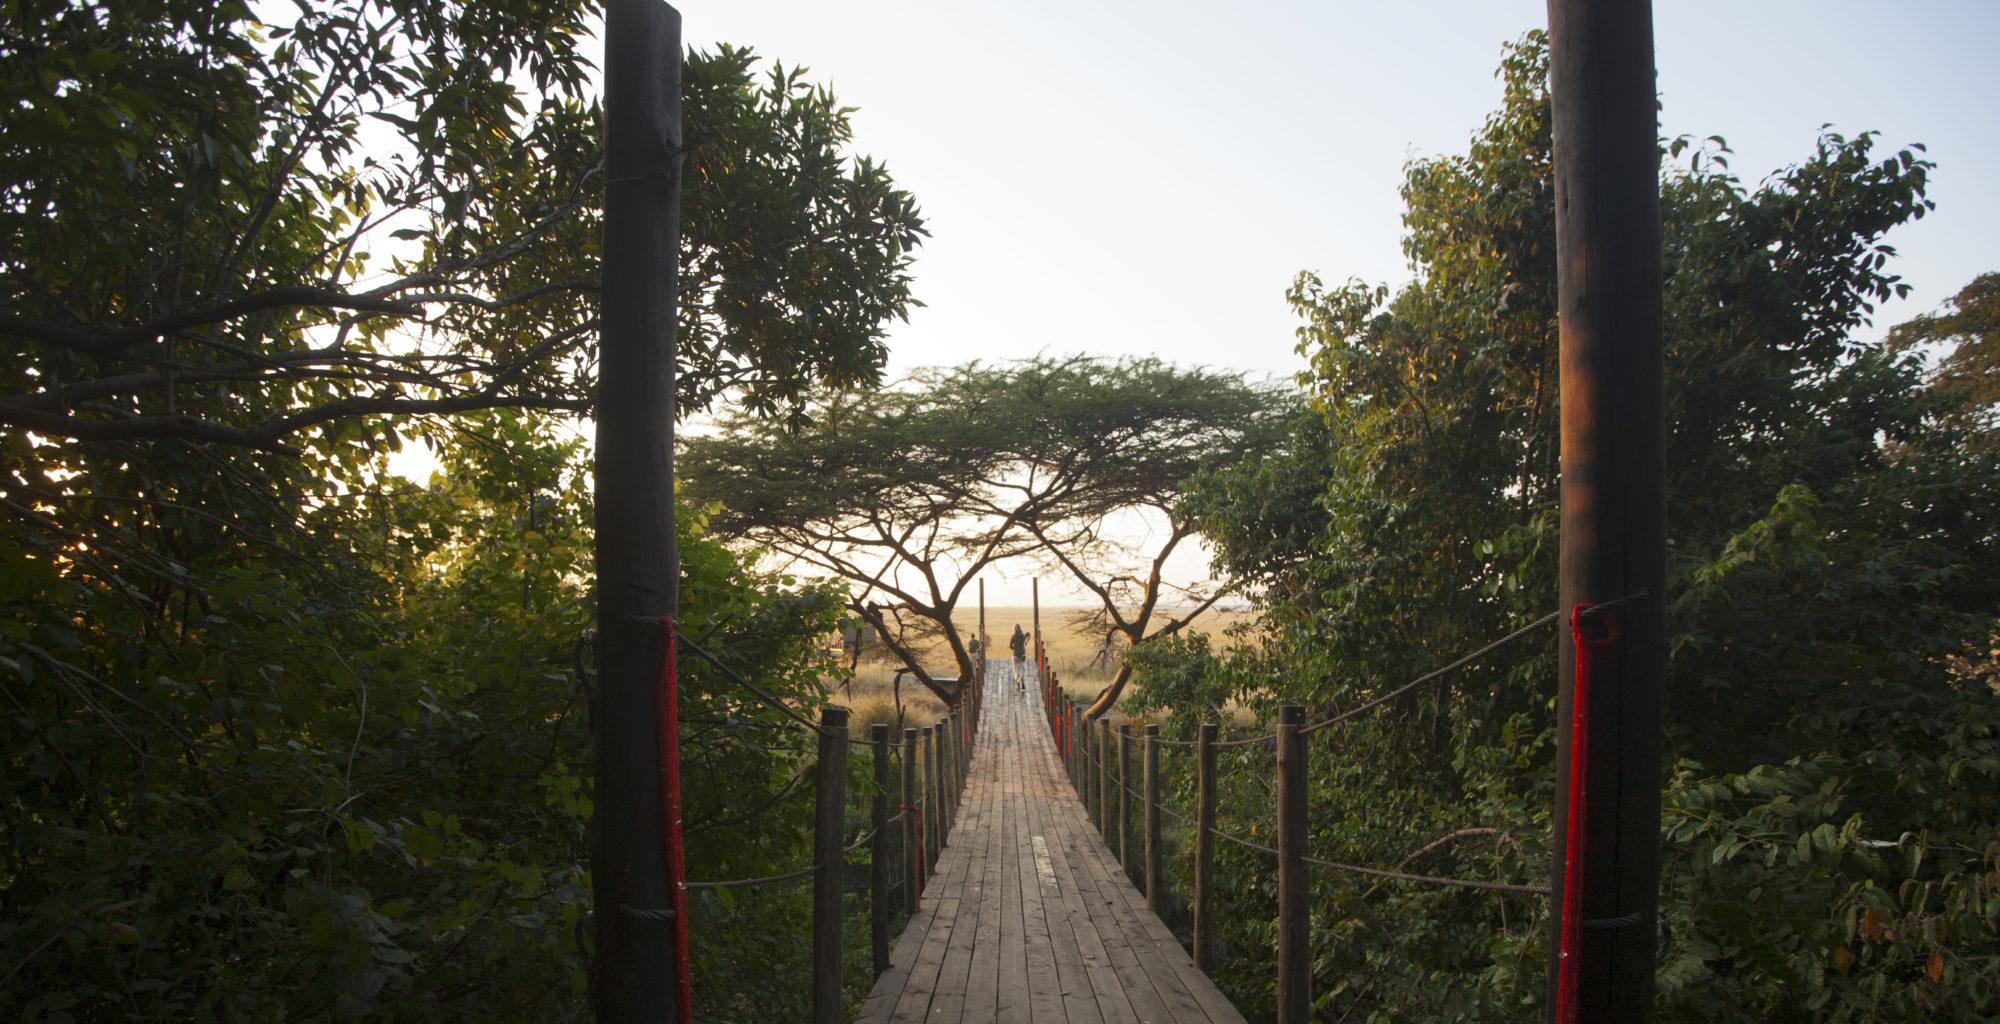 Mara Plains Camp Bridge by Beverly Joubert